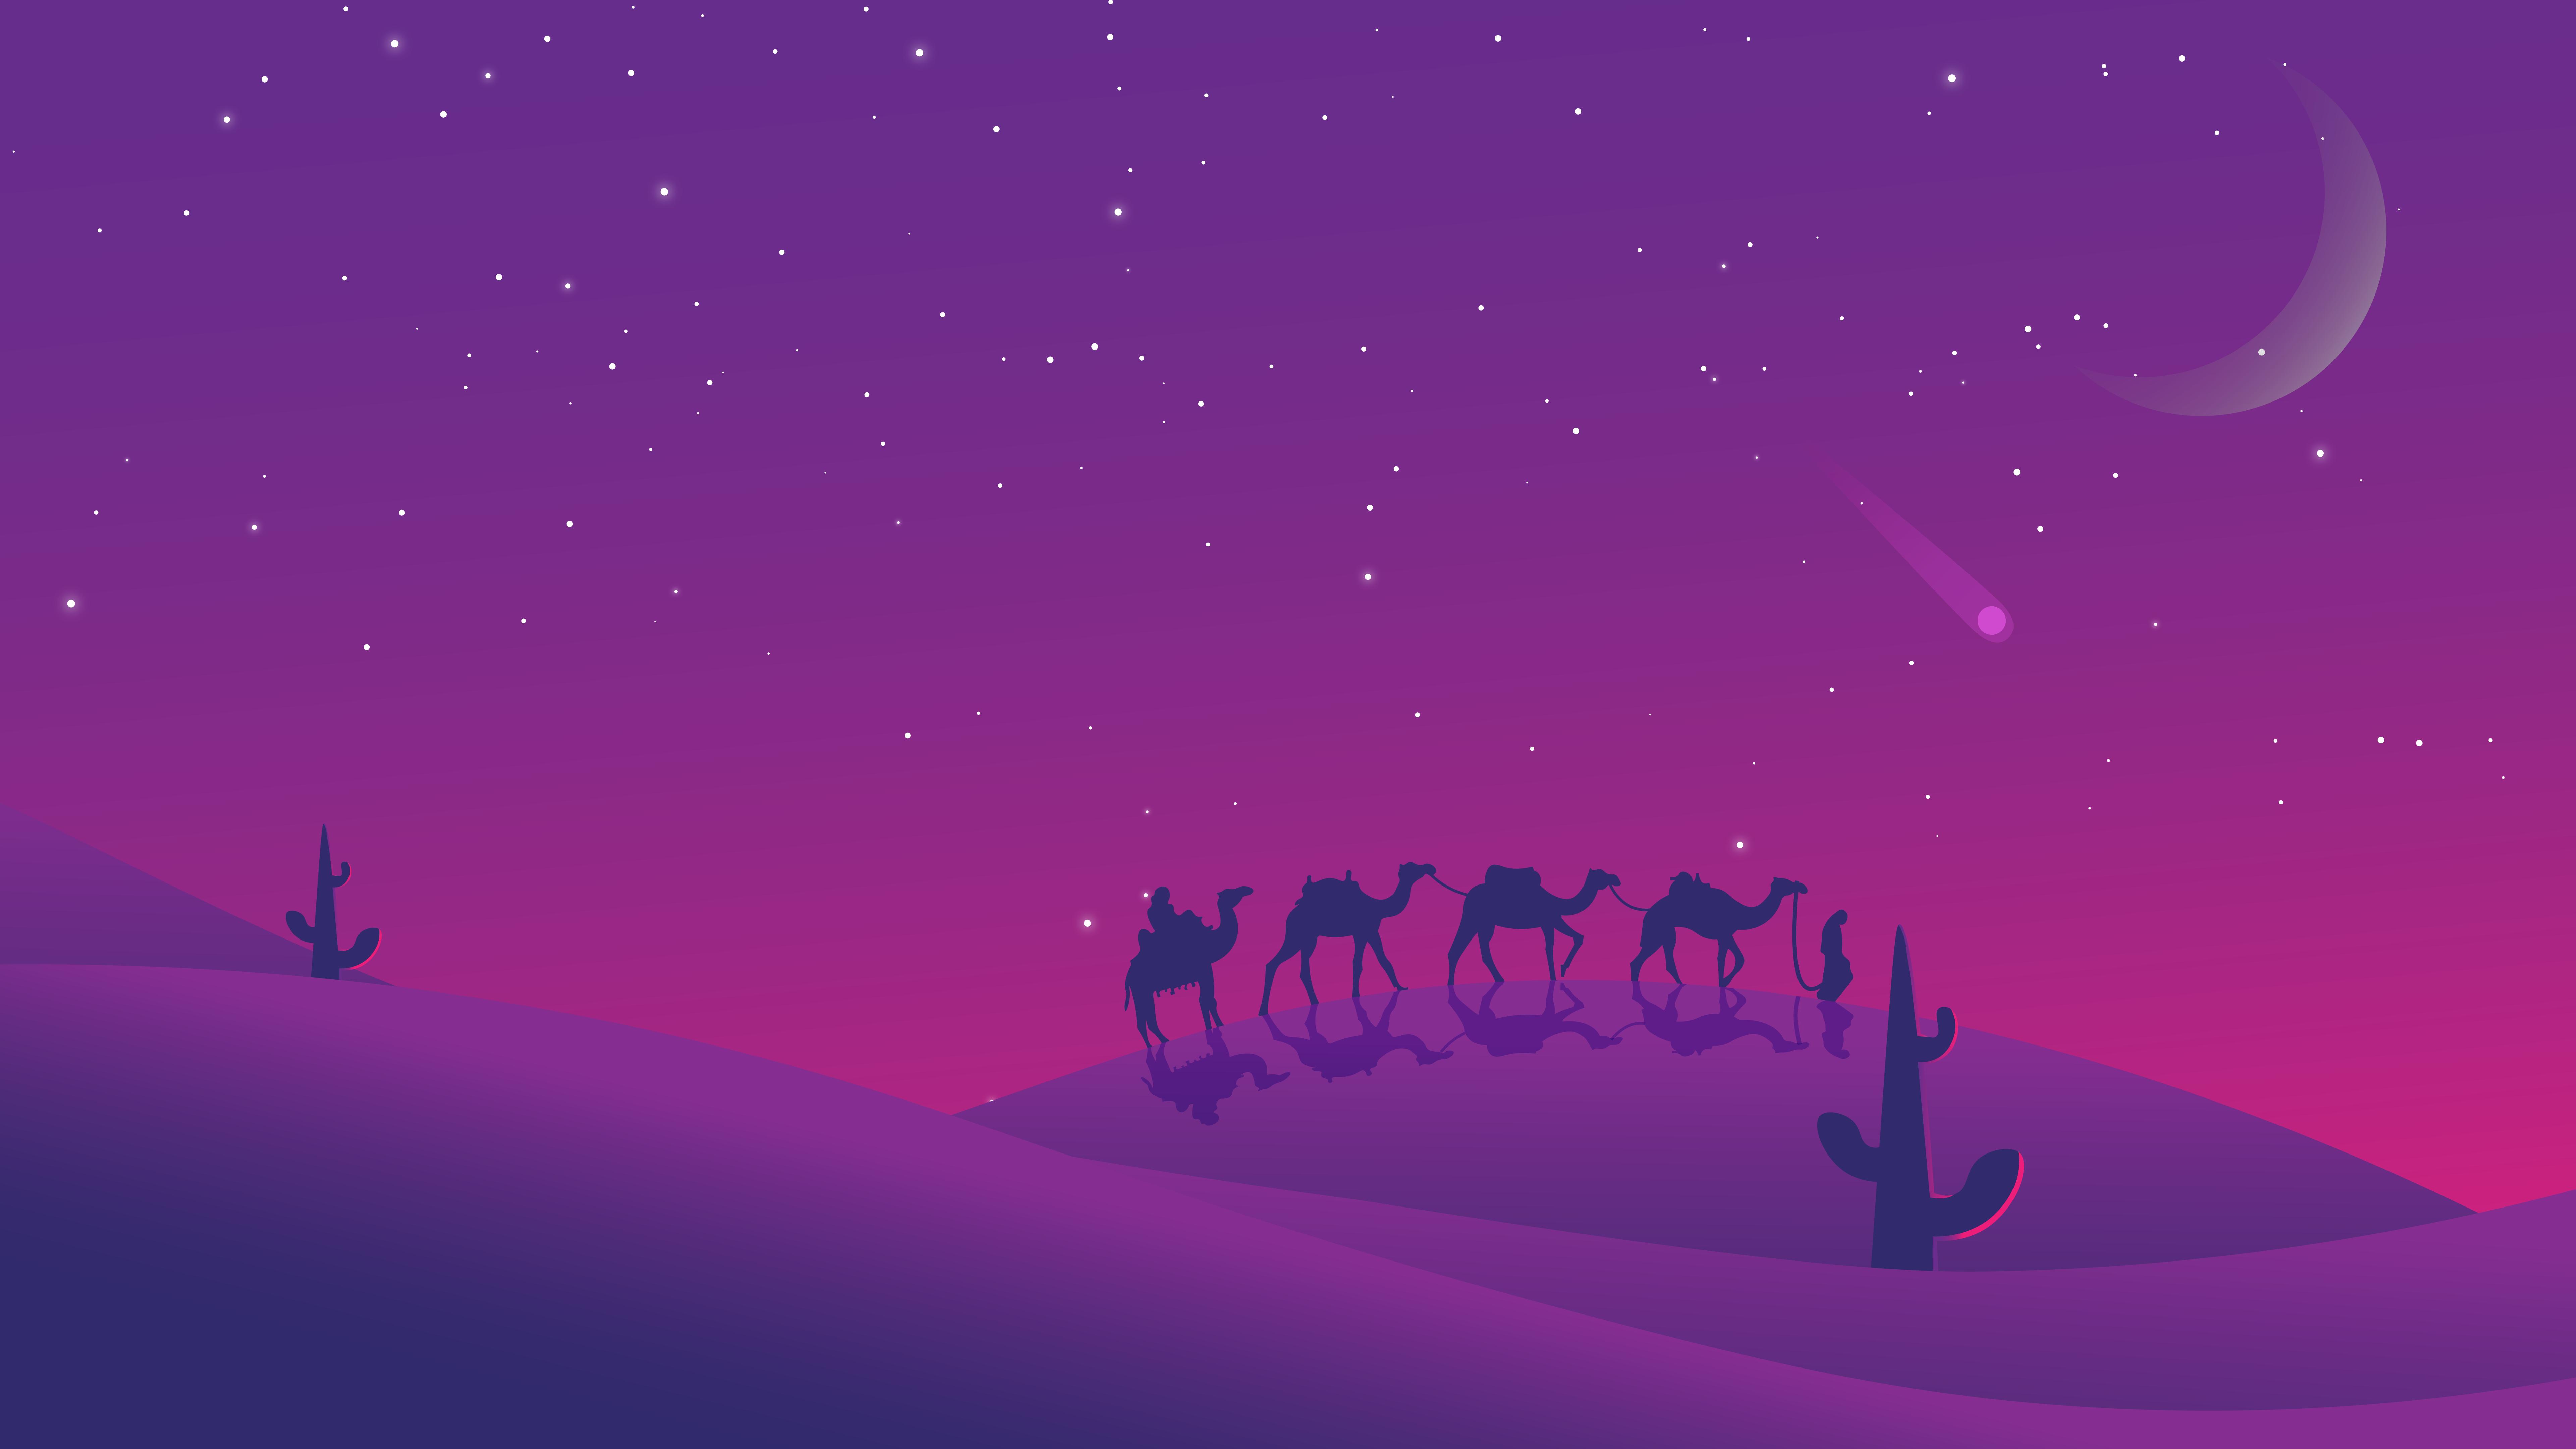 General 7680x4320 landscape desert night shooting stars purple background artwork